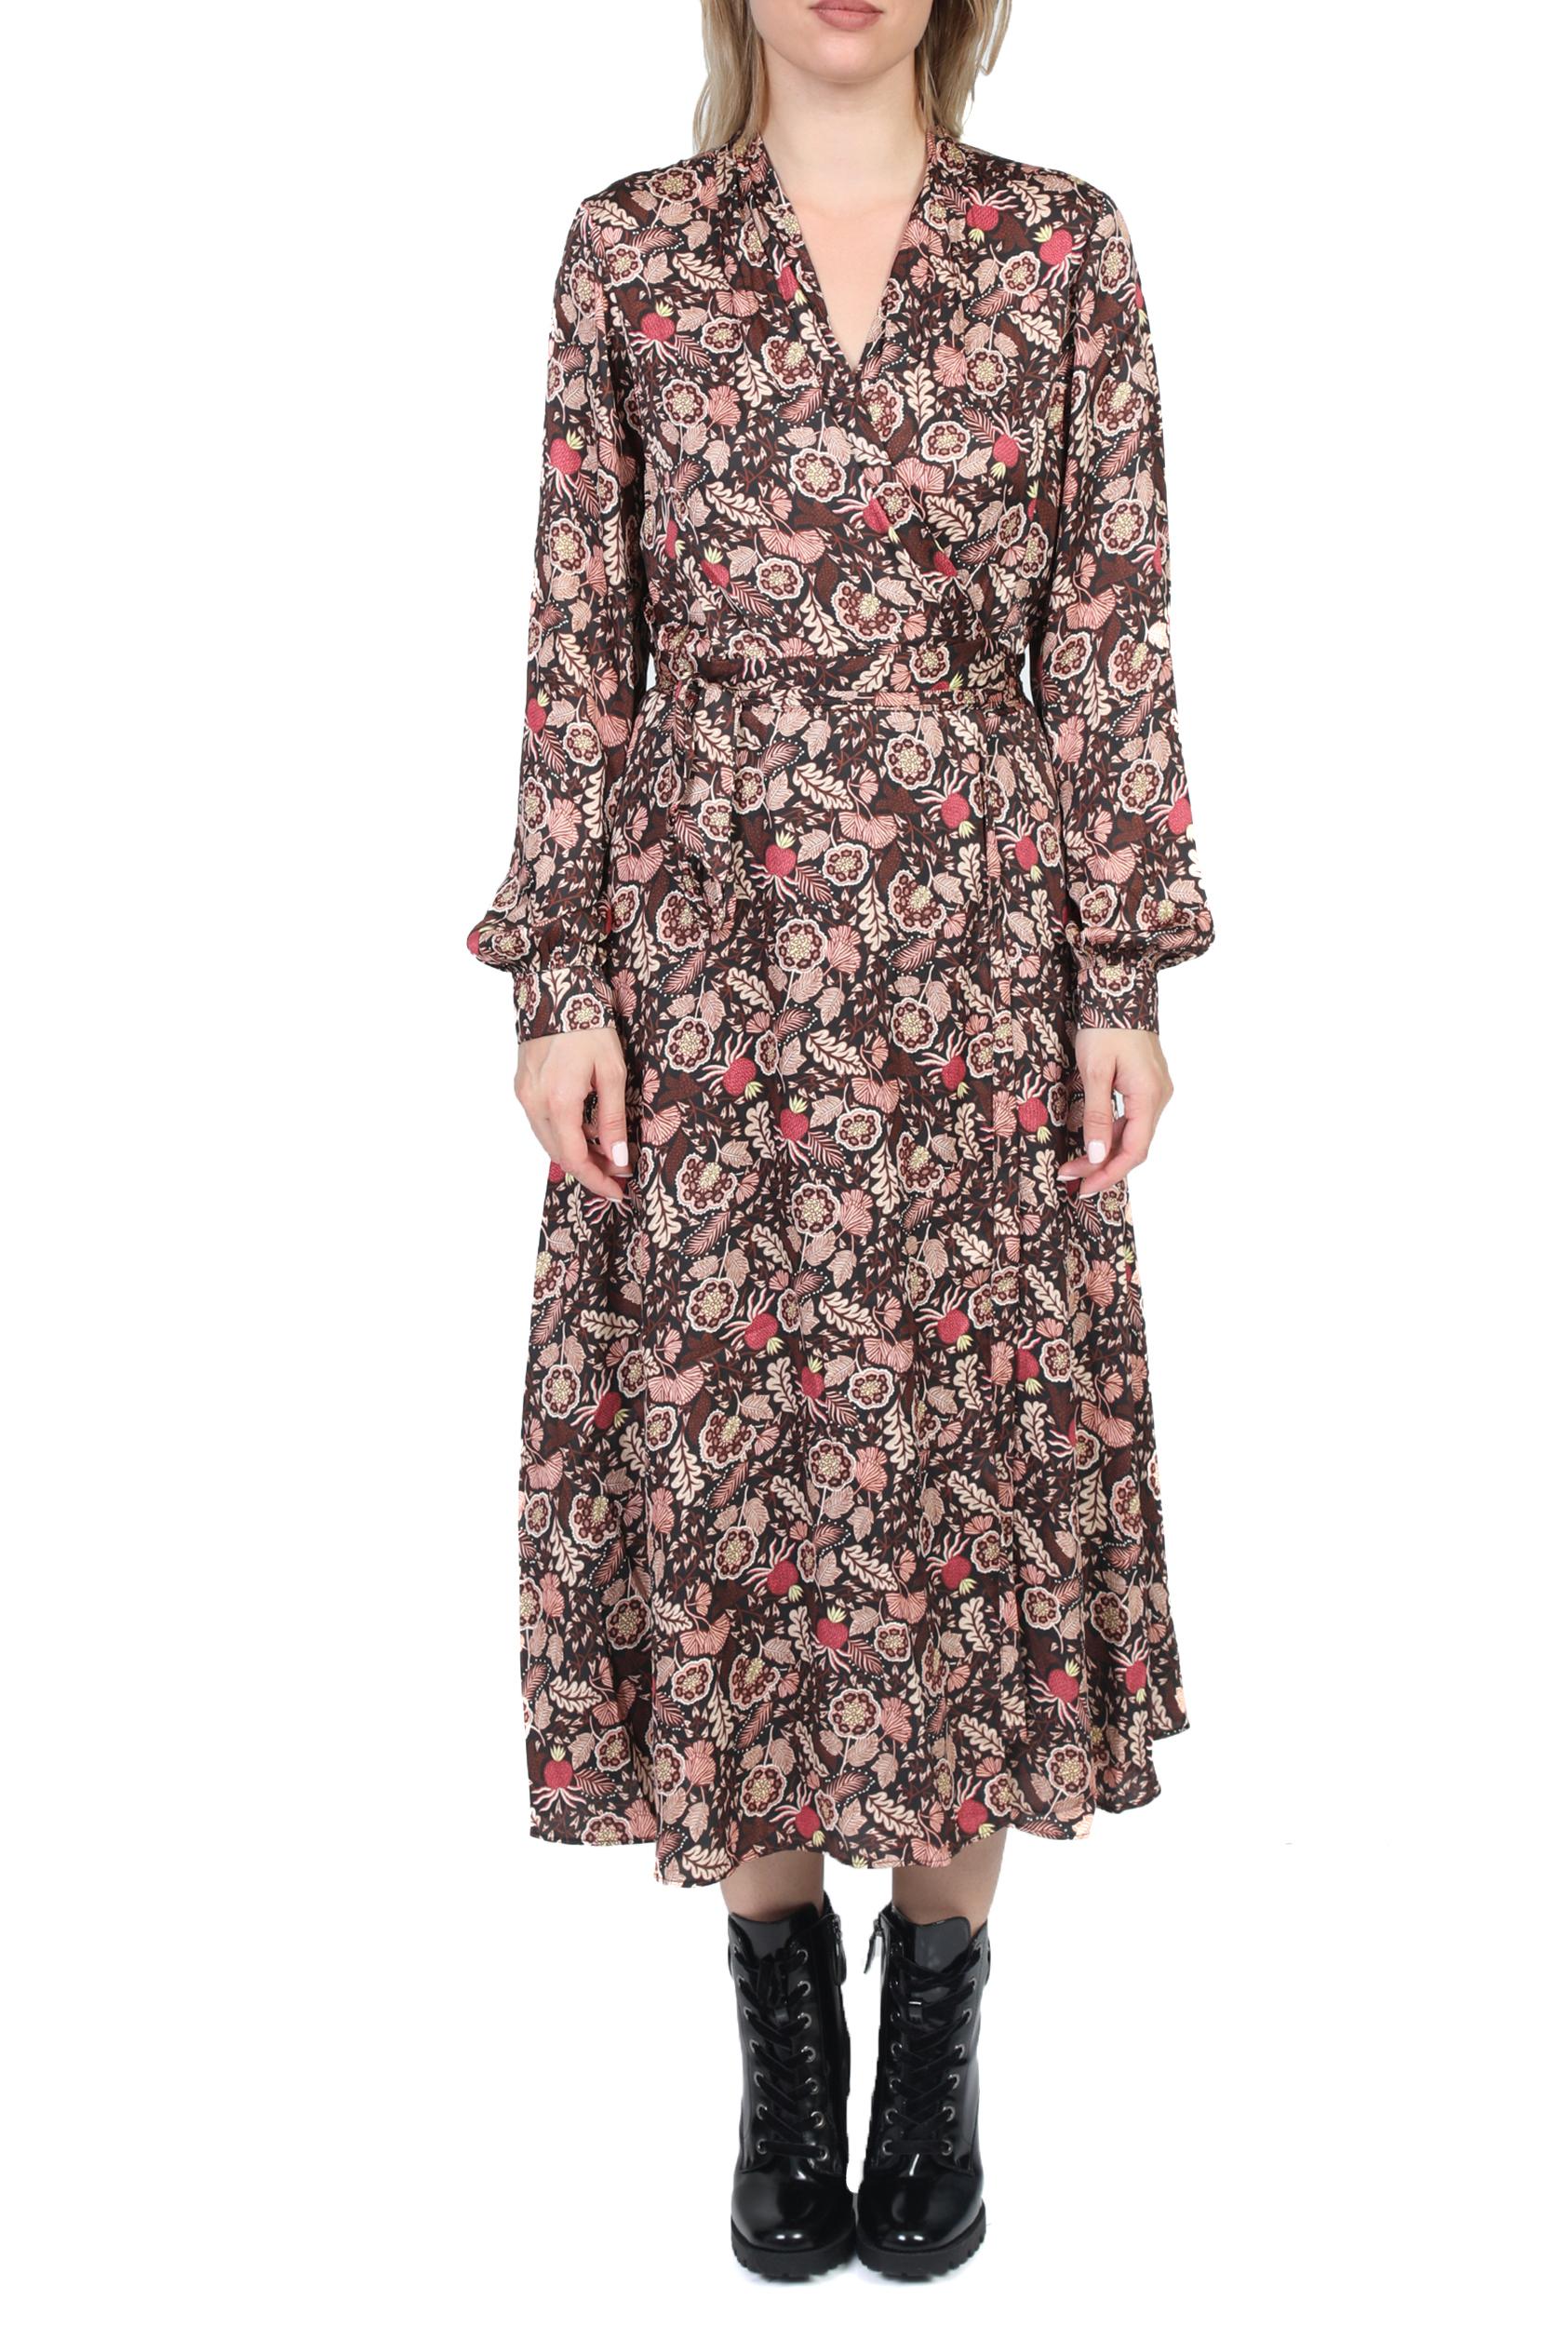 SCOTCH & SODA - Γυναικείο midi φόρεμα SCOTCH & SODA καφέ φλοράλ